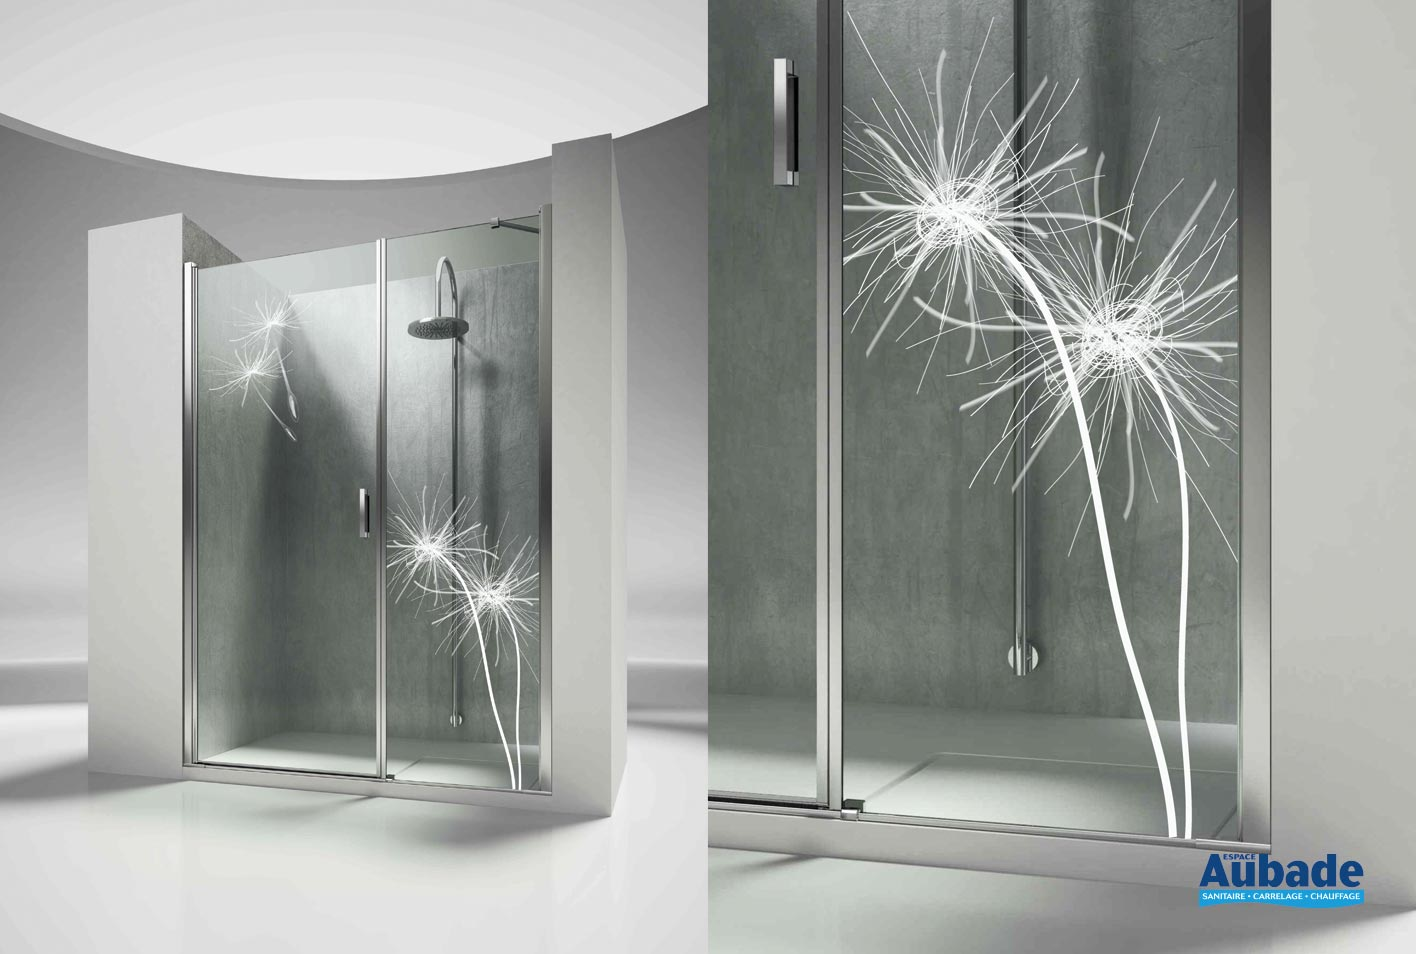 paroi de douche portes battantes vismara linea espace aubade. Black Bedroom Furniture Sets. Home Design Ideas